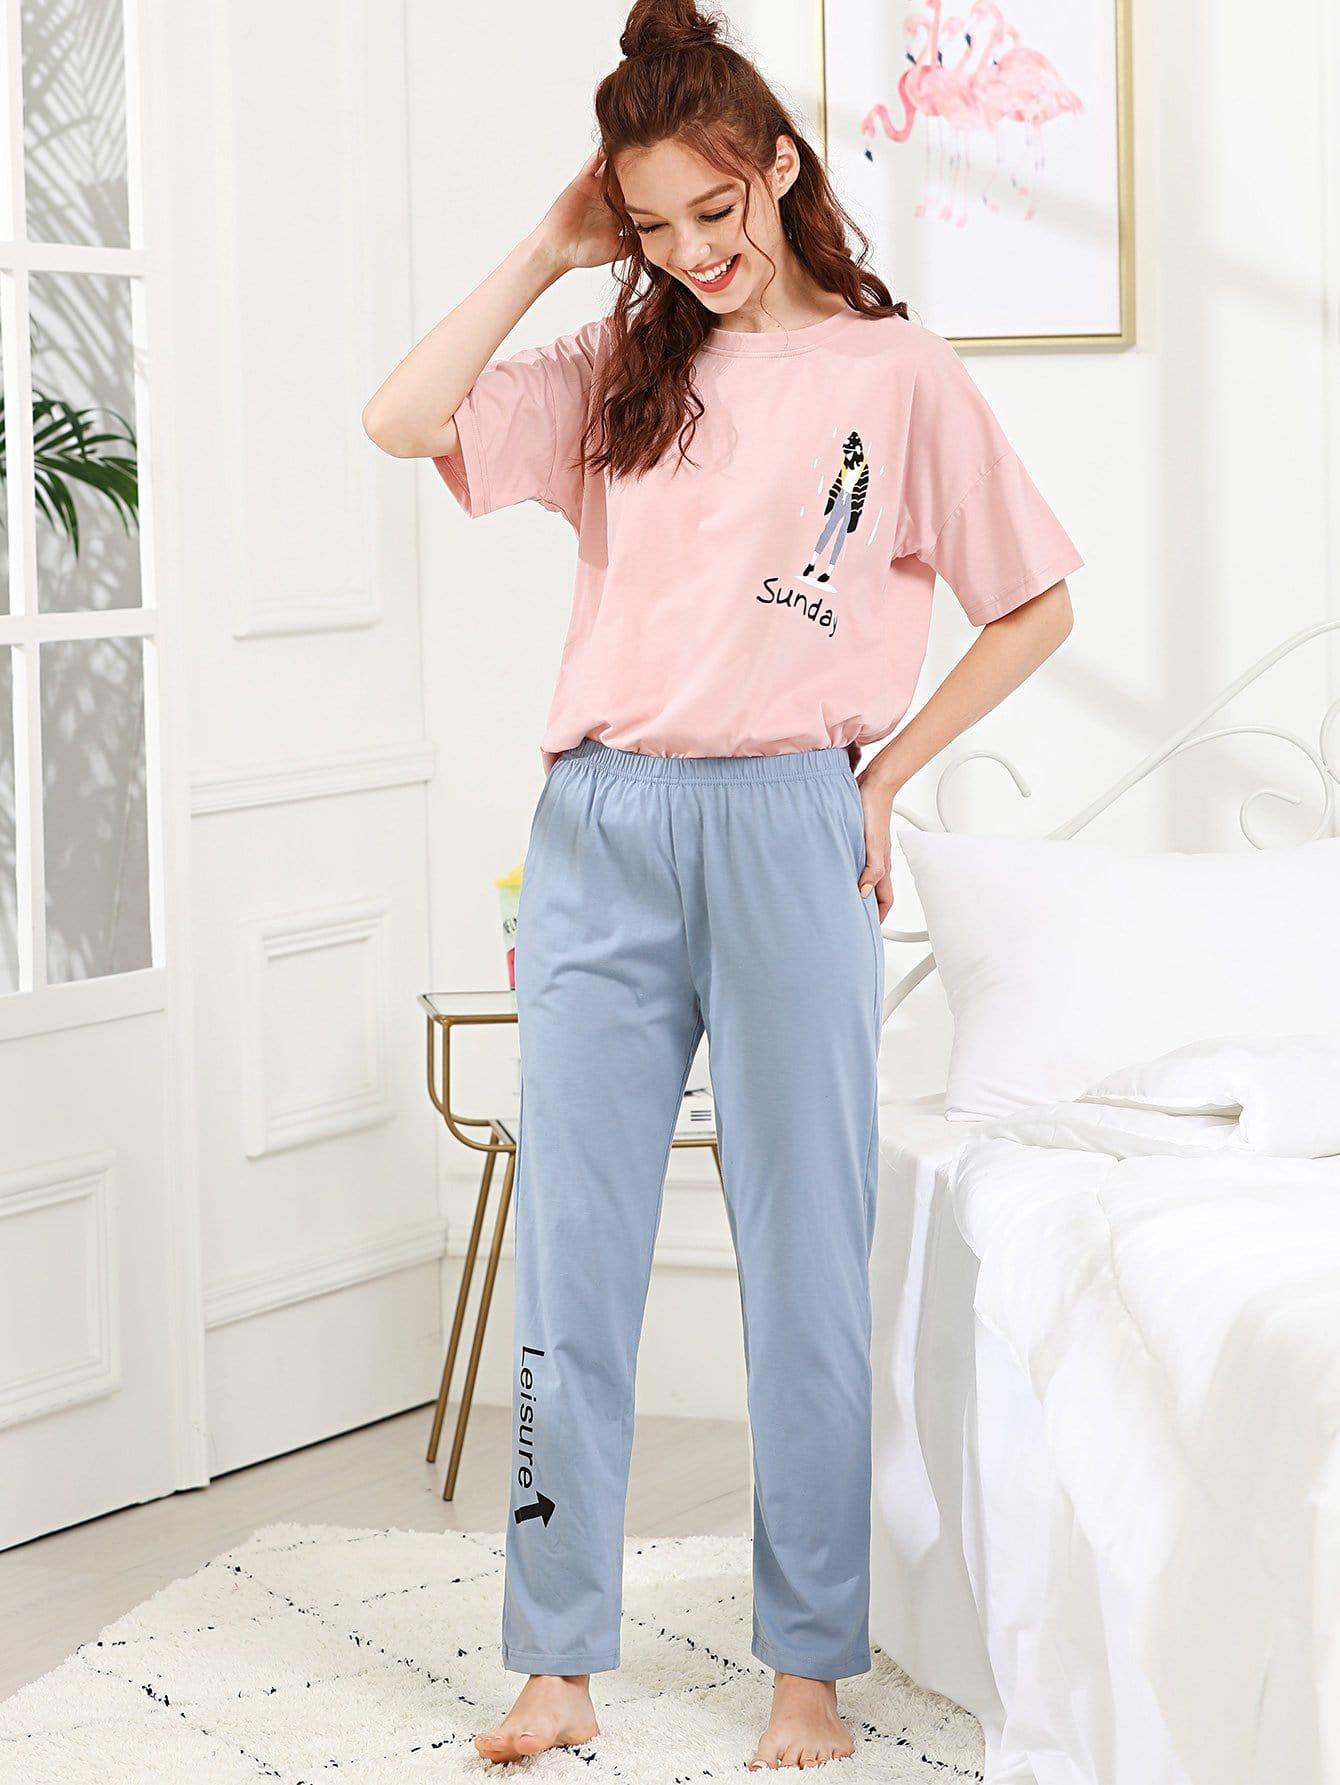 Cartoon & Letter Print Pajama Set all over cartoon print pajama set